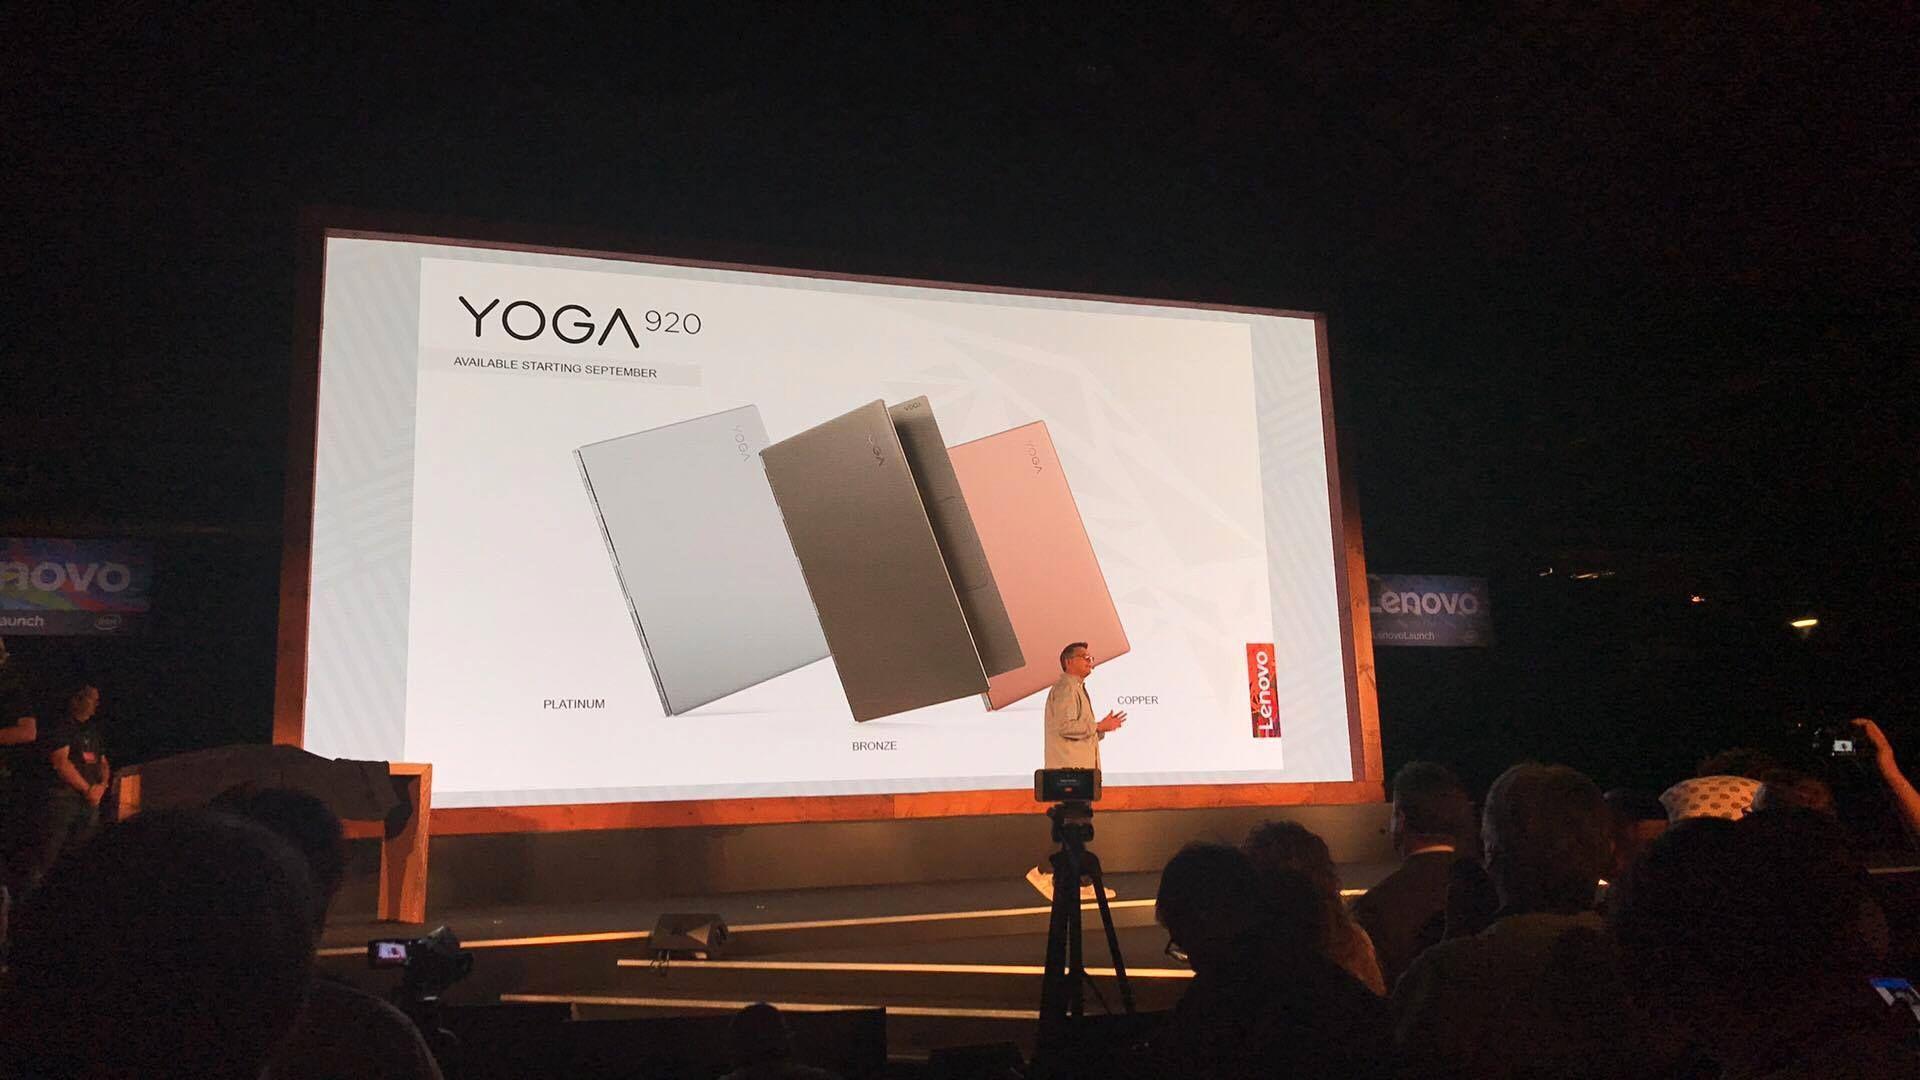 Nye Yoga 920 vises frem..